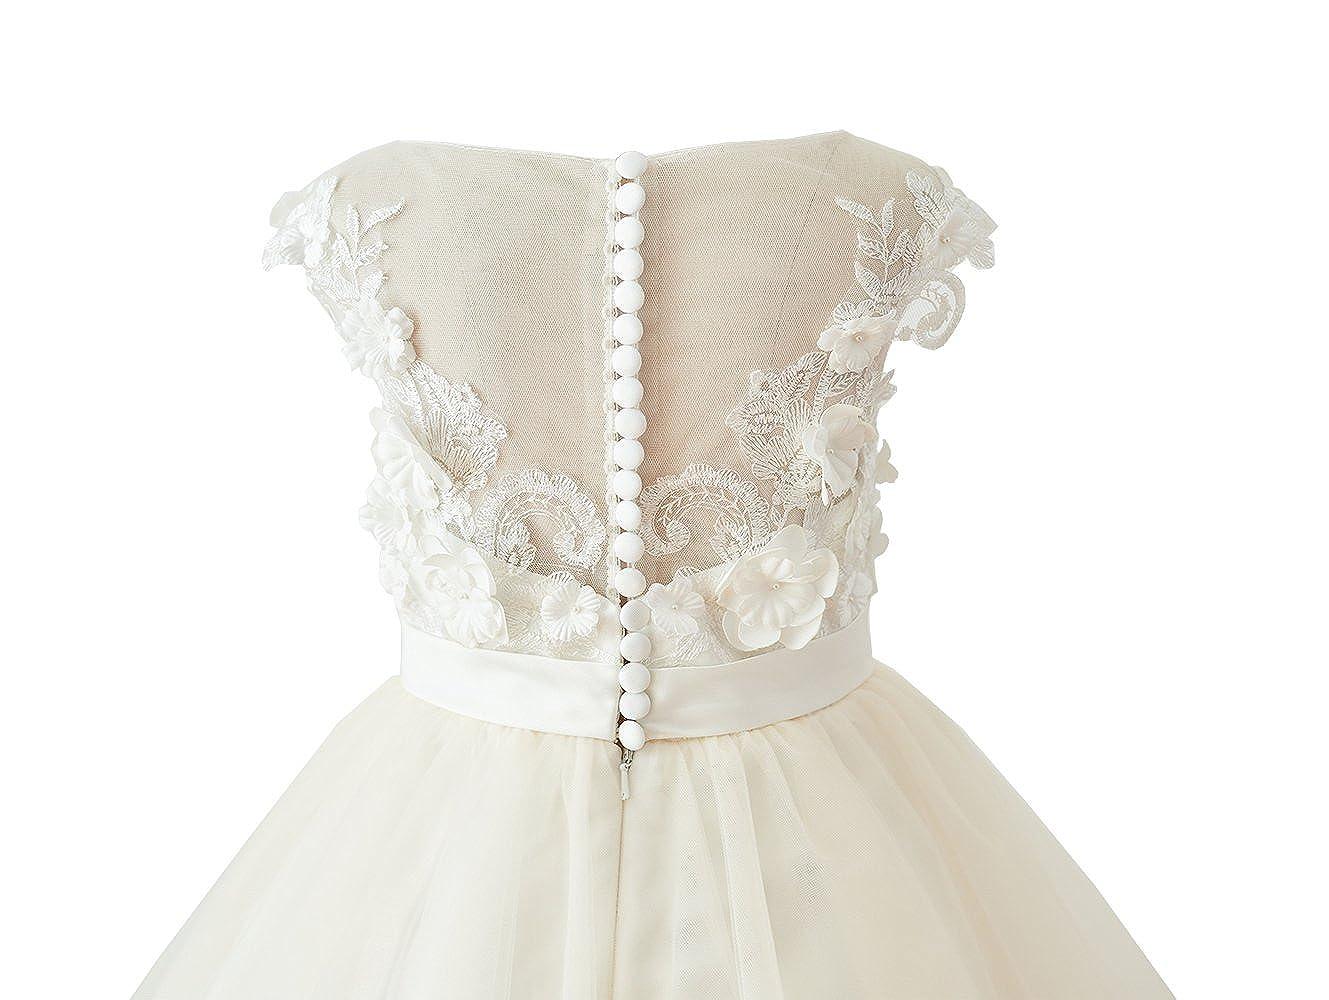 aac193f2b8d Amazon.com  Miama Ivory Lace Champagne Tulle Wedding Flower Girl Dress  Junior Bridesmaid Dress  Clothing